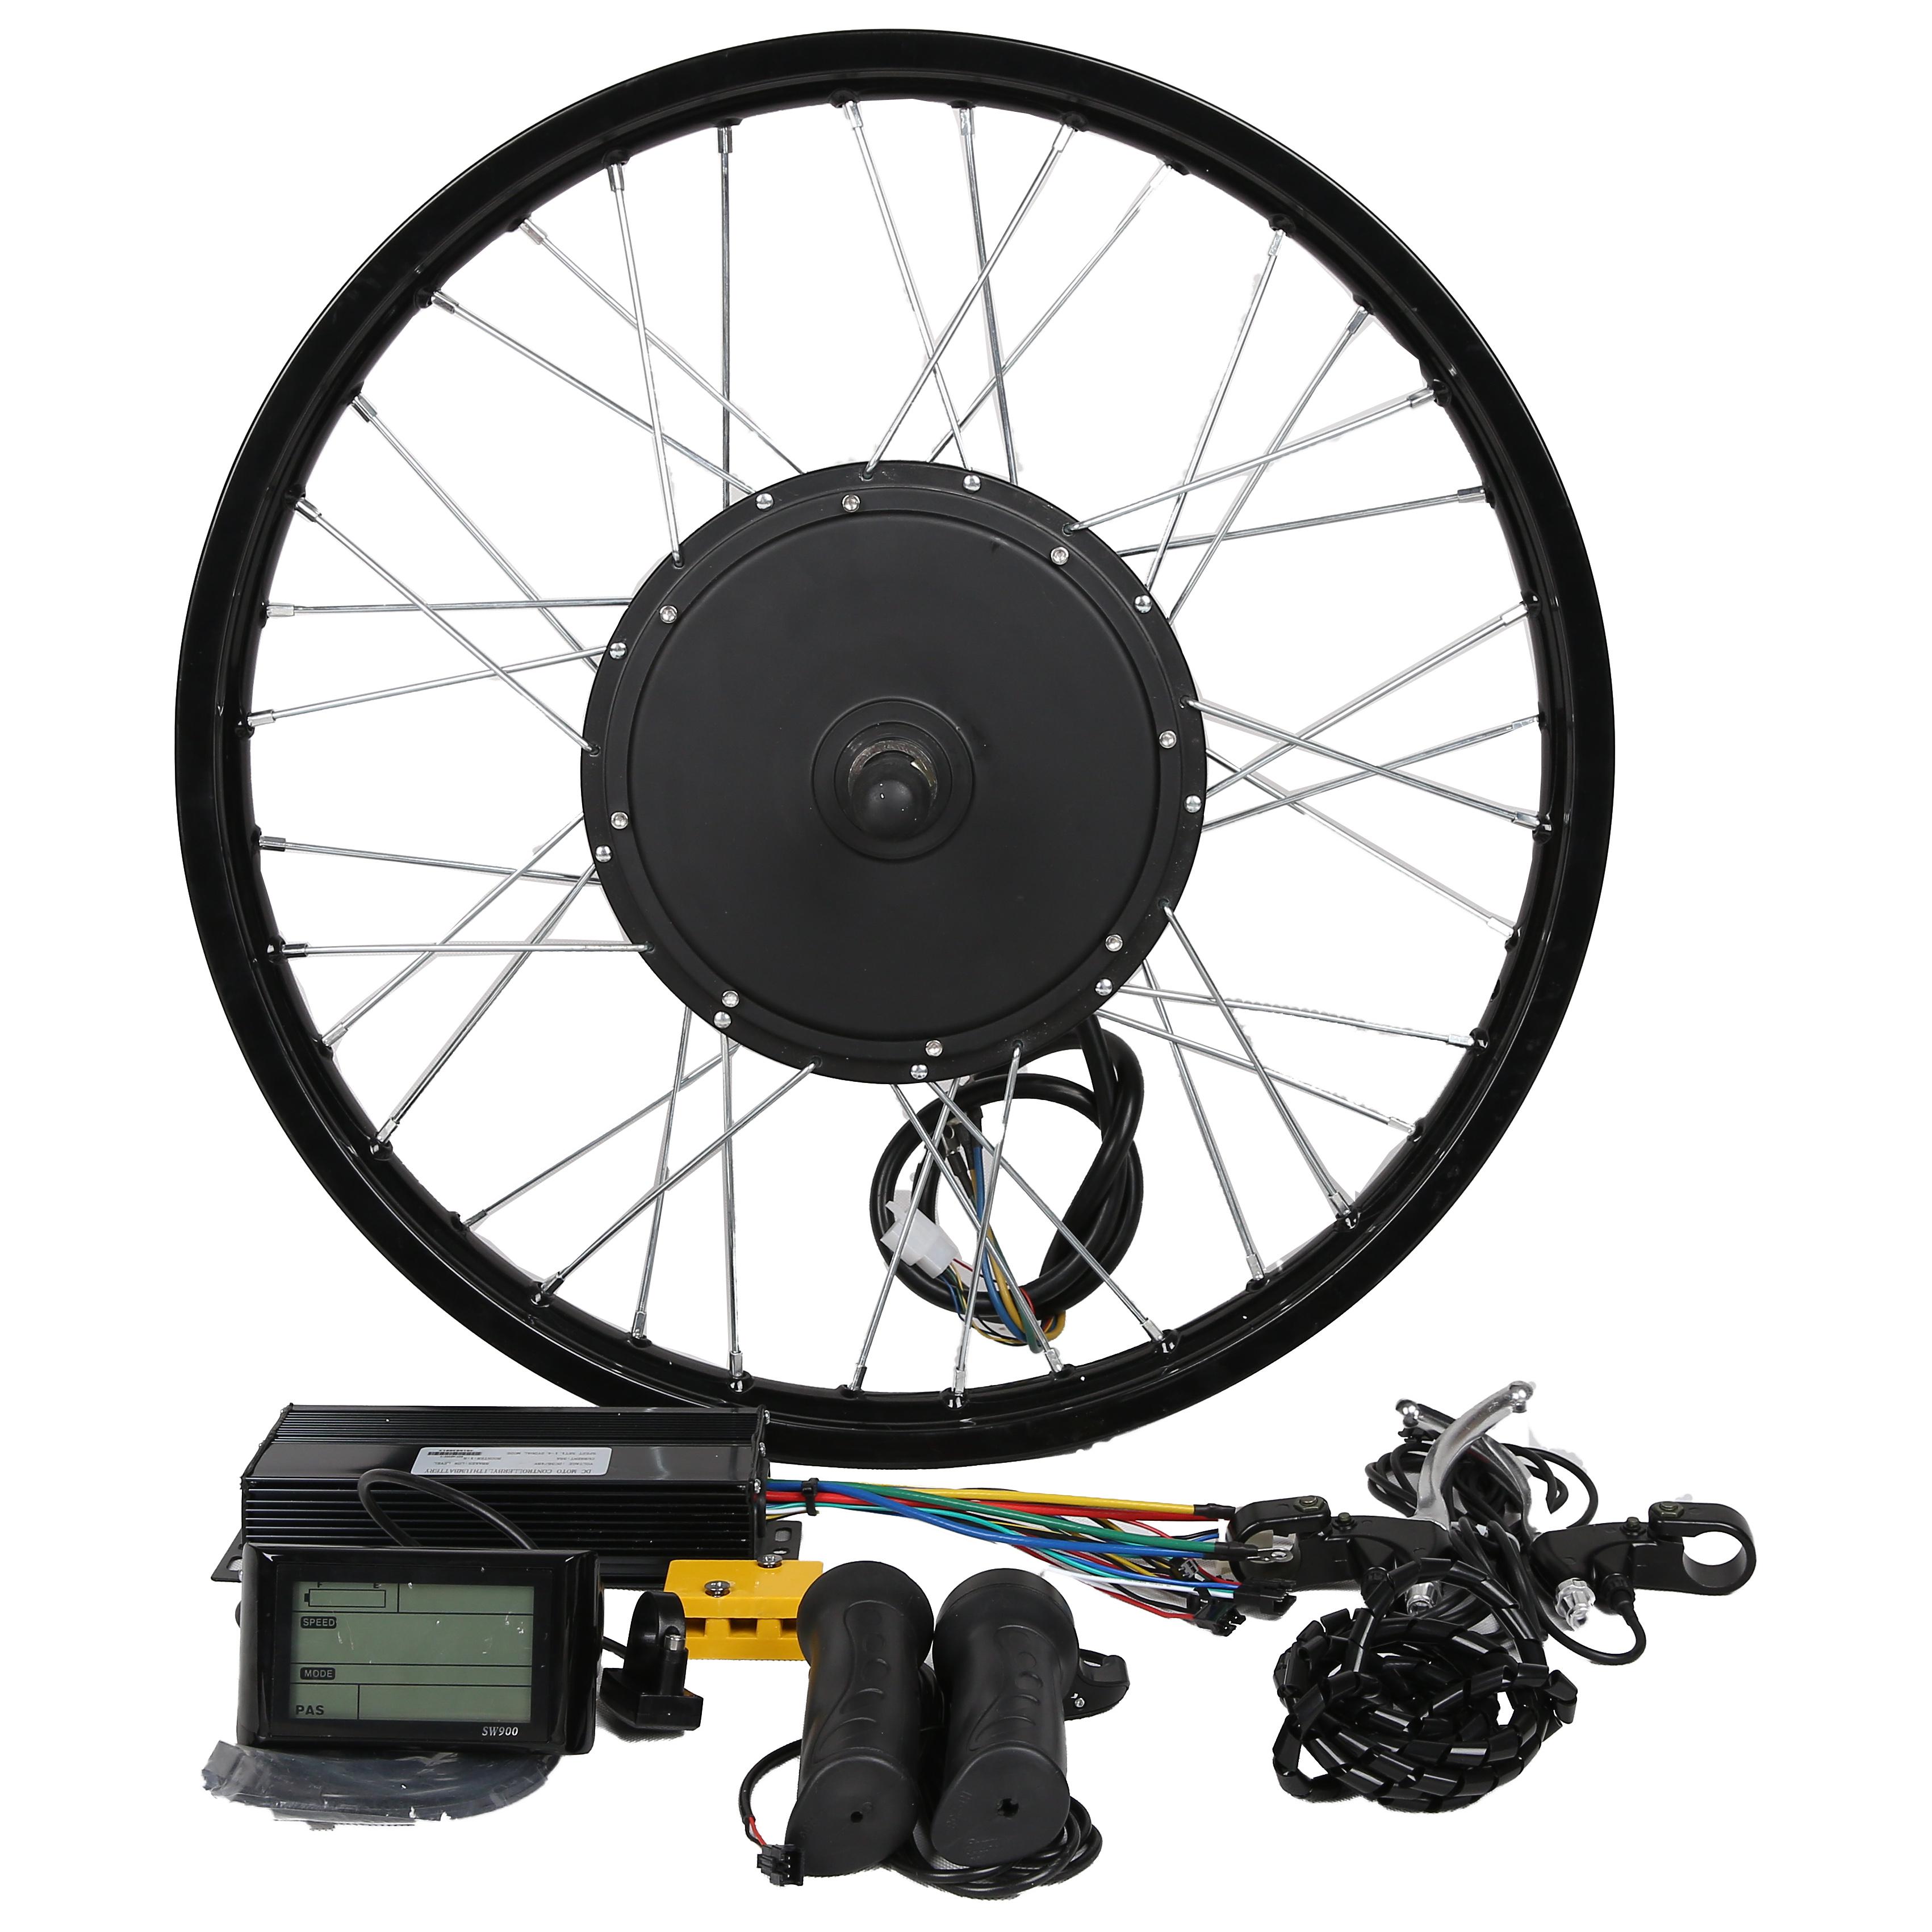 120km/h!High Power60V-96V brushless hub motor 3000w 5000w 8000w e bike conversion kit with 18''19''20''21''26'700C28''29'''wheel